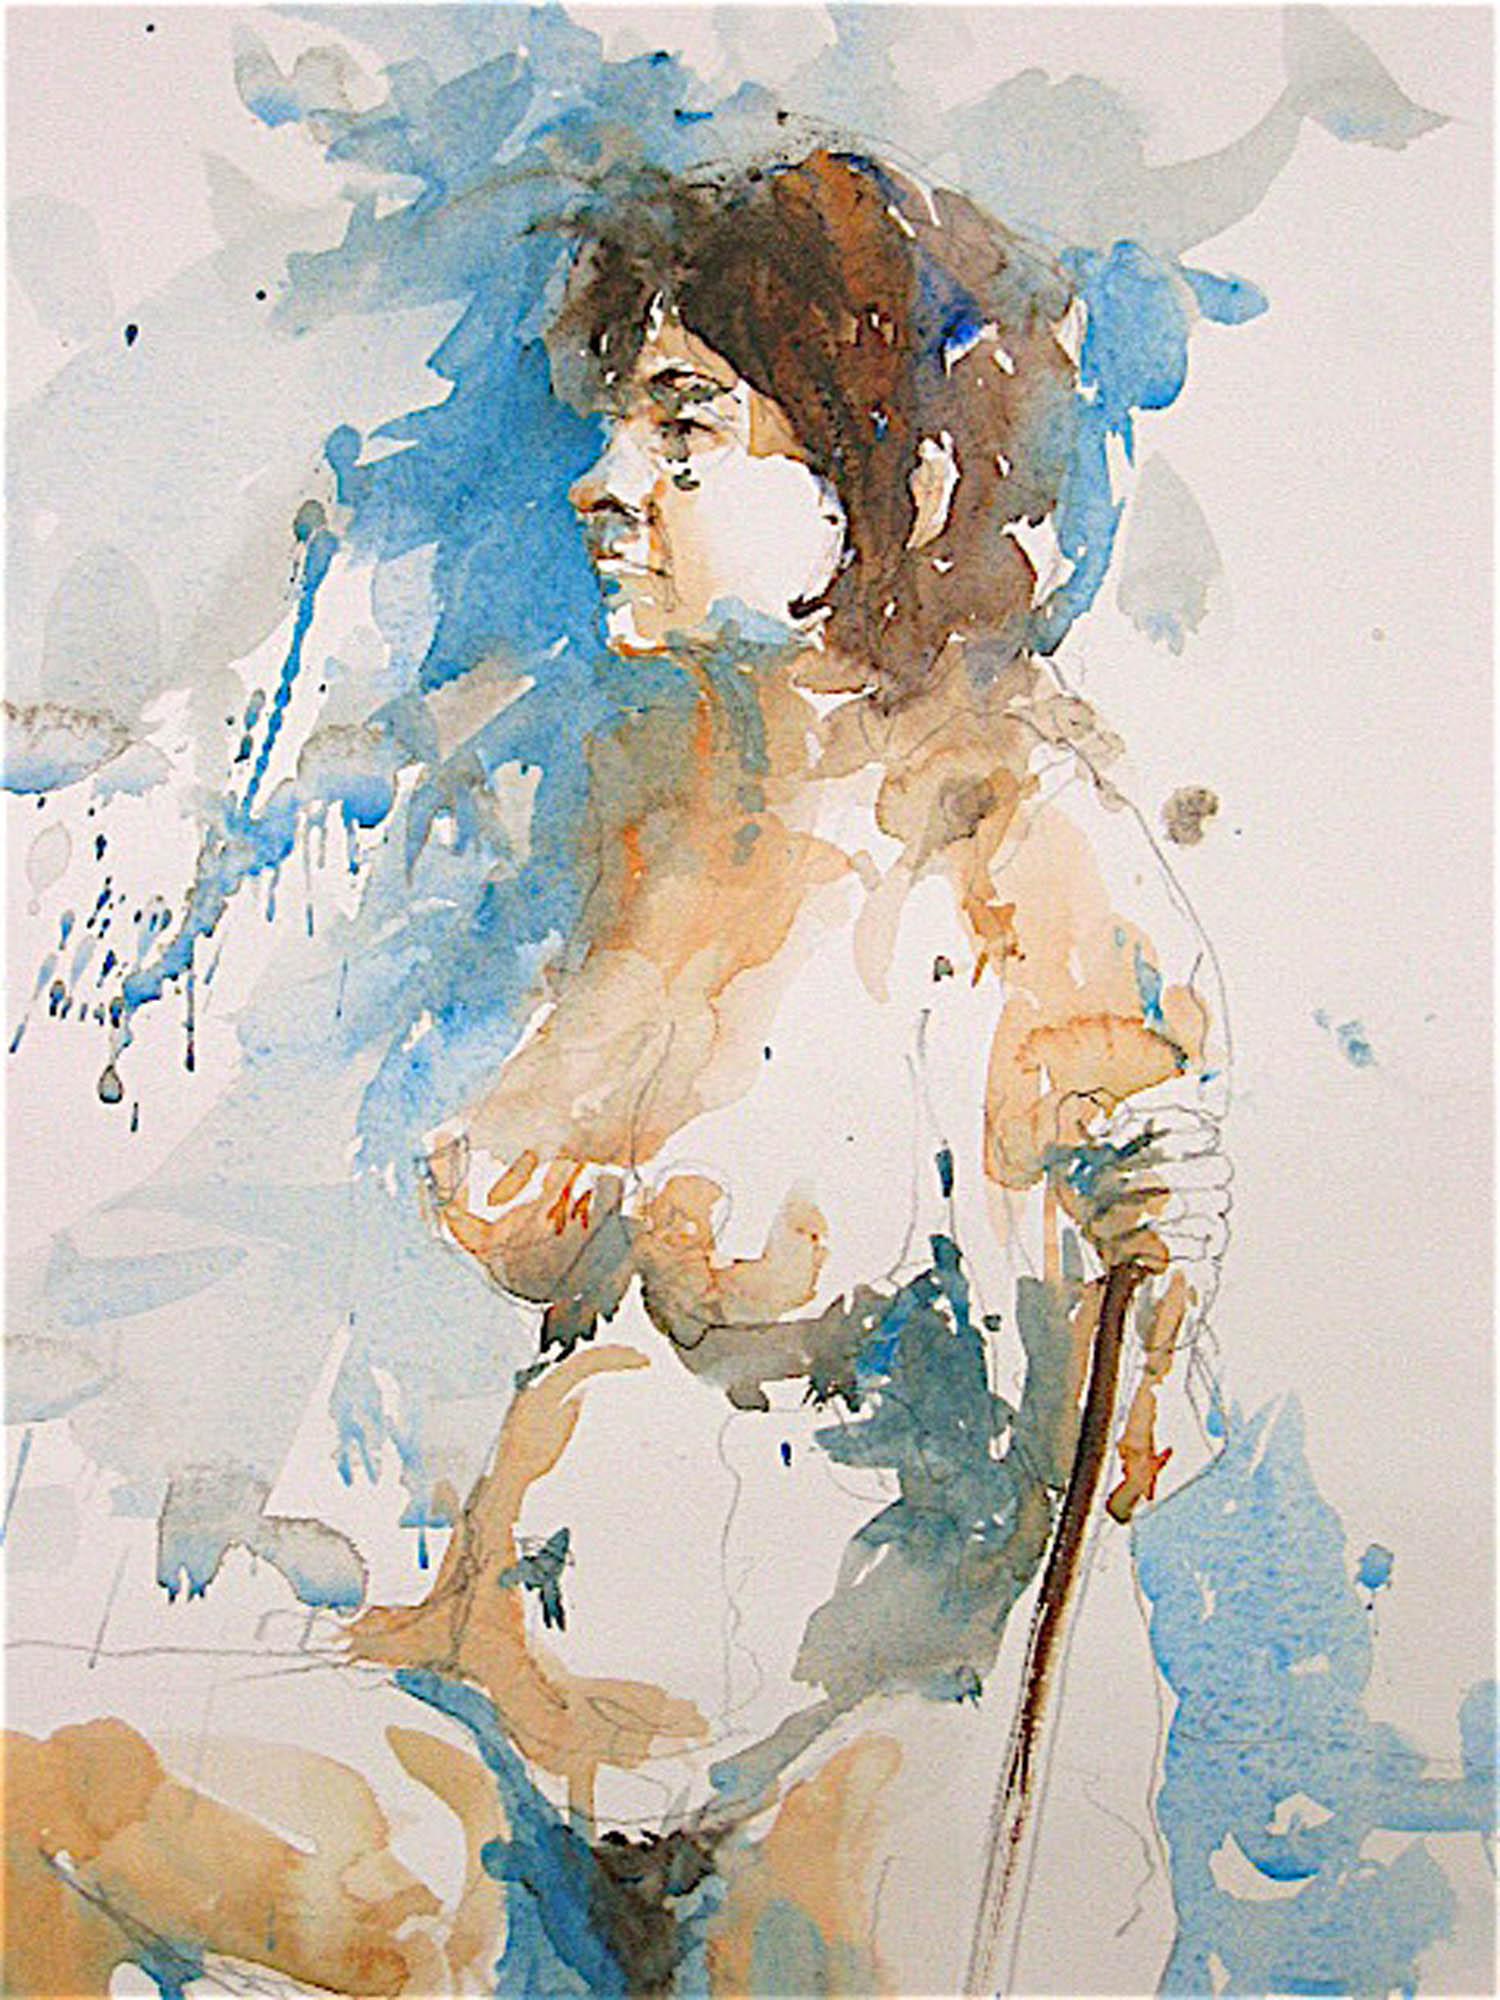 Watercolour: 22 x 15in